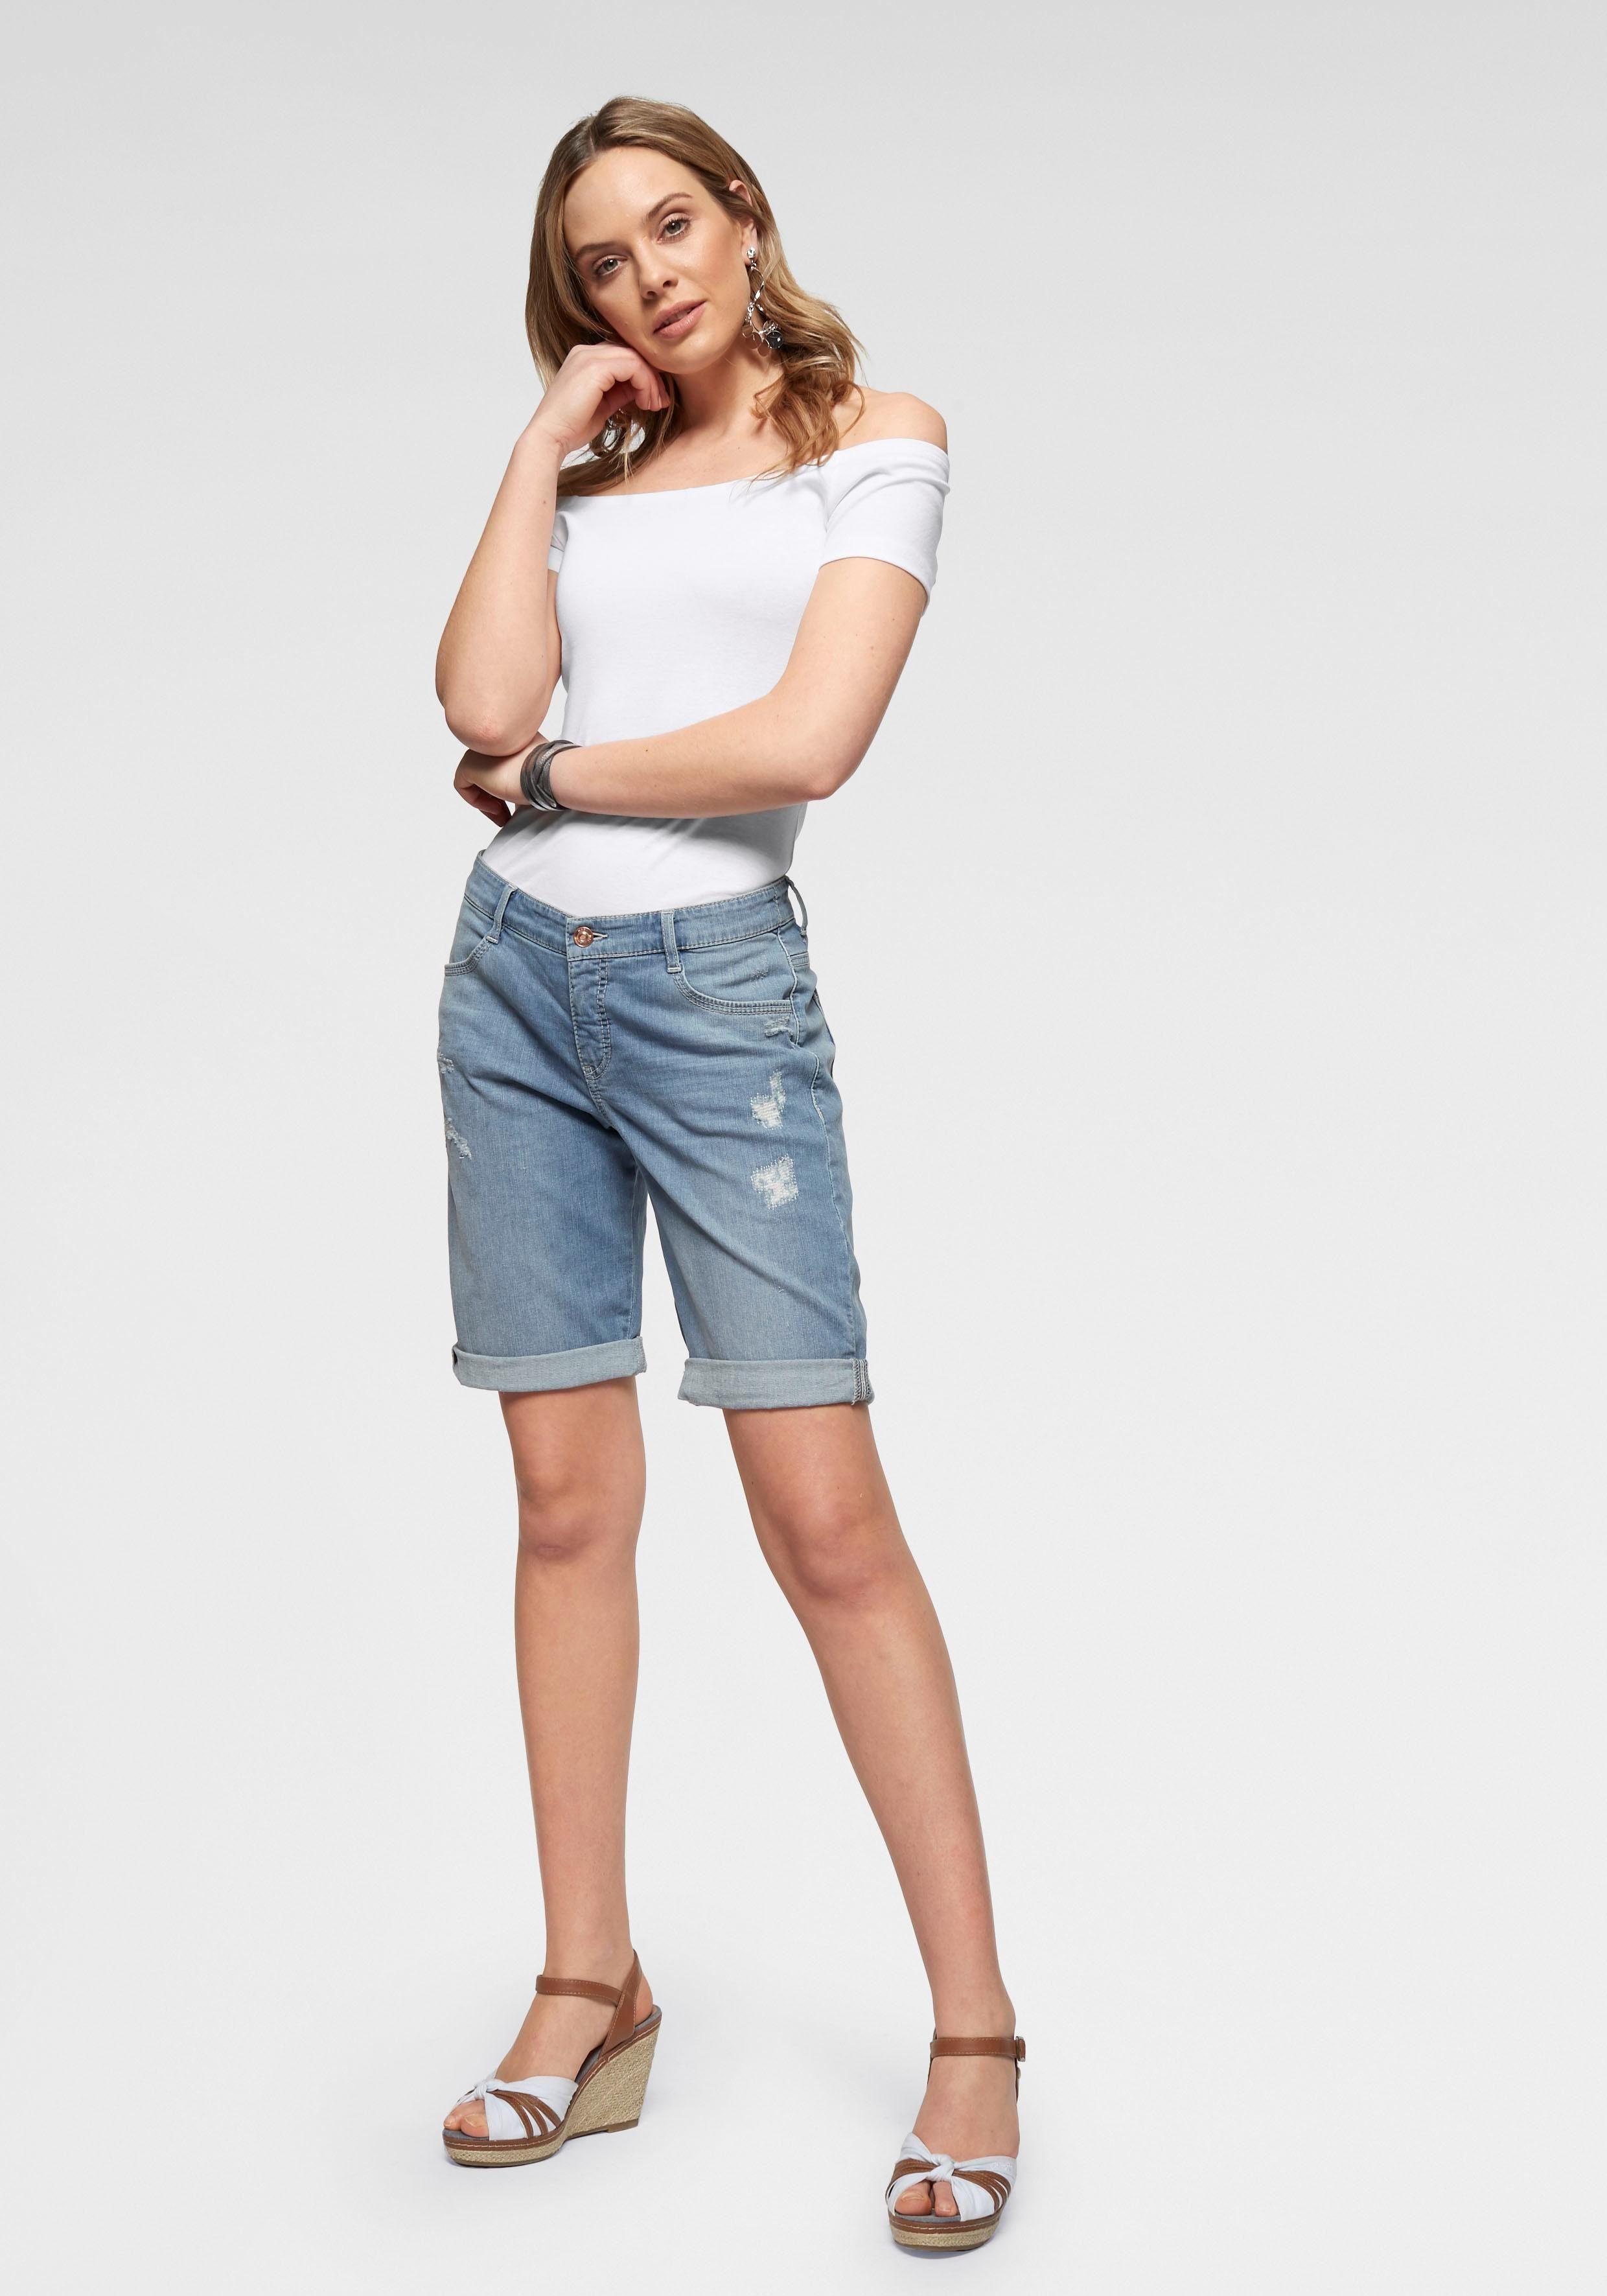 Mac Online Summer Kaufen Saum Shorts Krempelbarem Mit Clean« Jeansbermudas »shorty DH9WIY2E